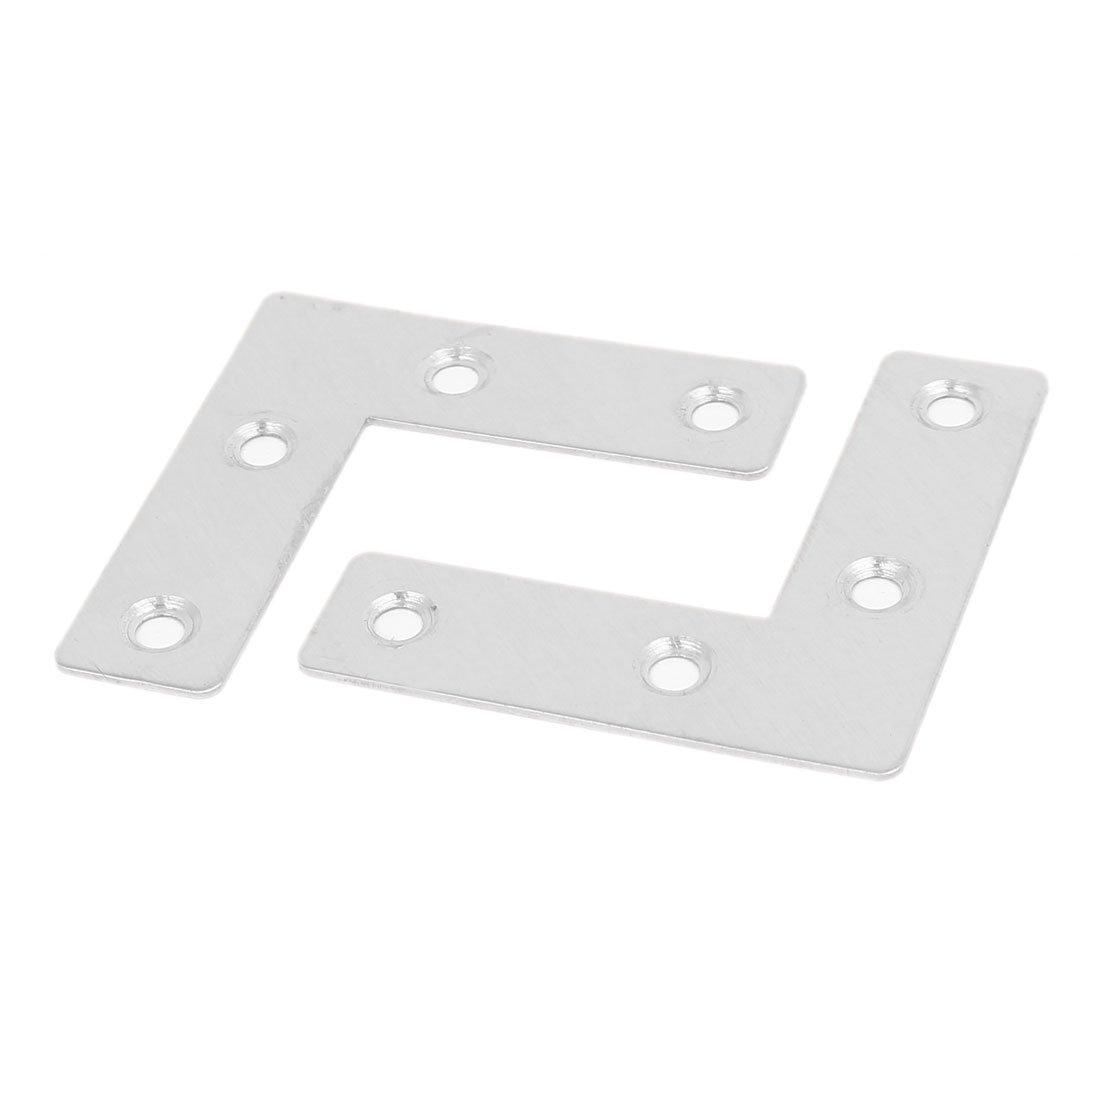 uxcell 50mm x 50mm x 1mm Stainless Steel L Shape Corner Brace Flat Mending Plate 100pcs a16063000ux0469